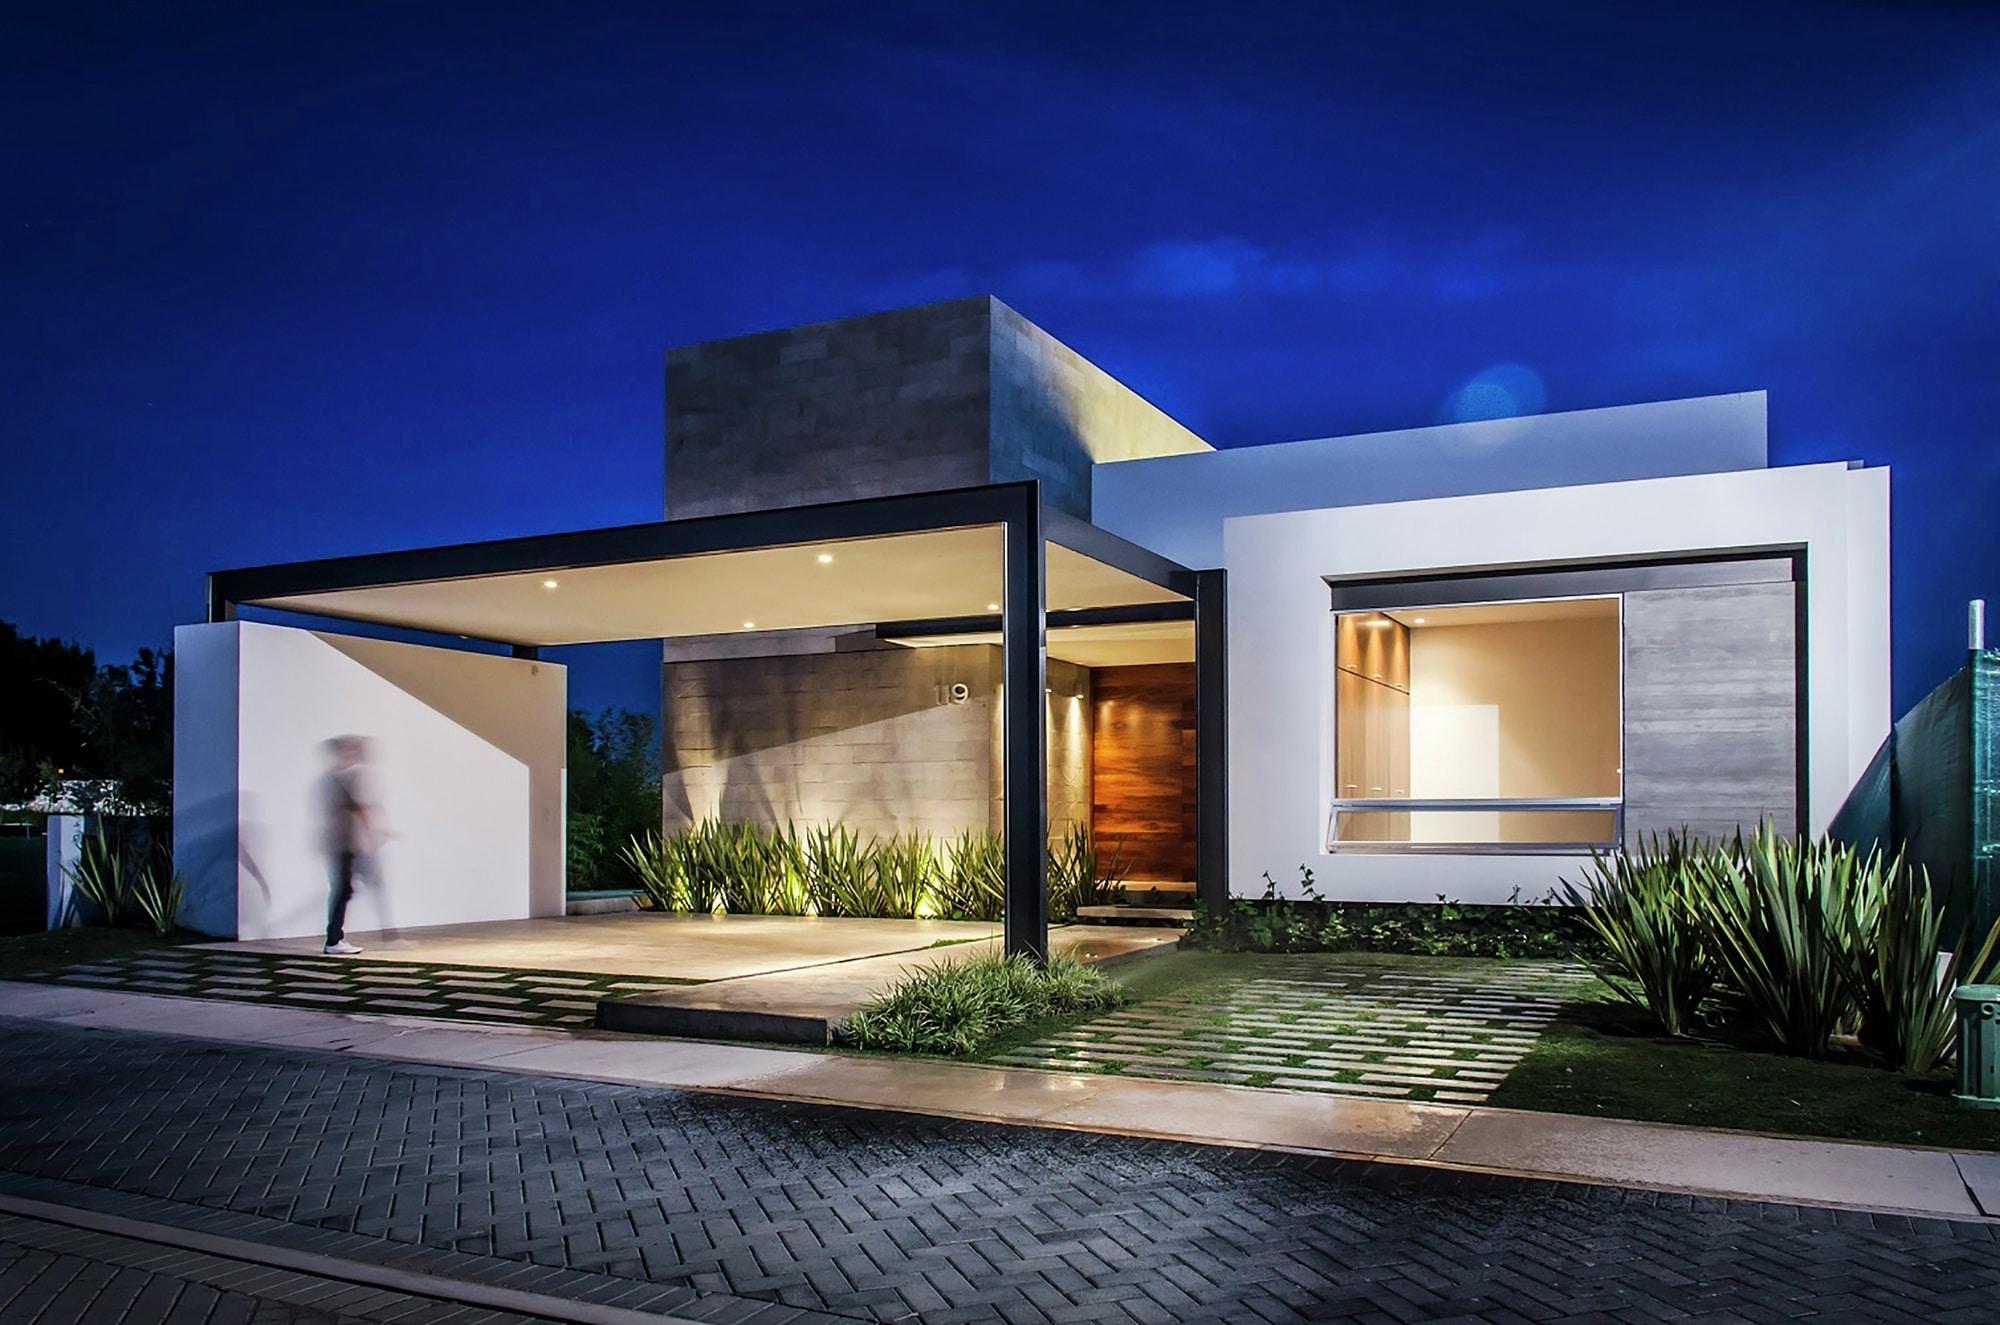 dise o casa moderna de un piso construye hogar On casa y diseno